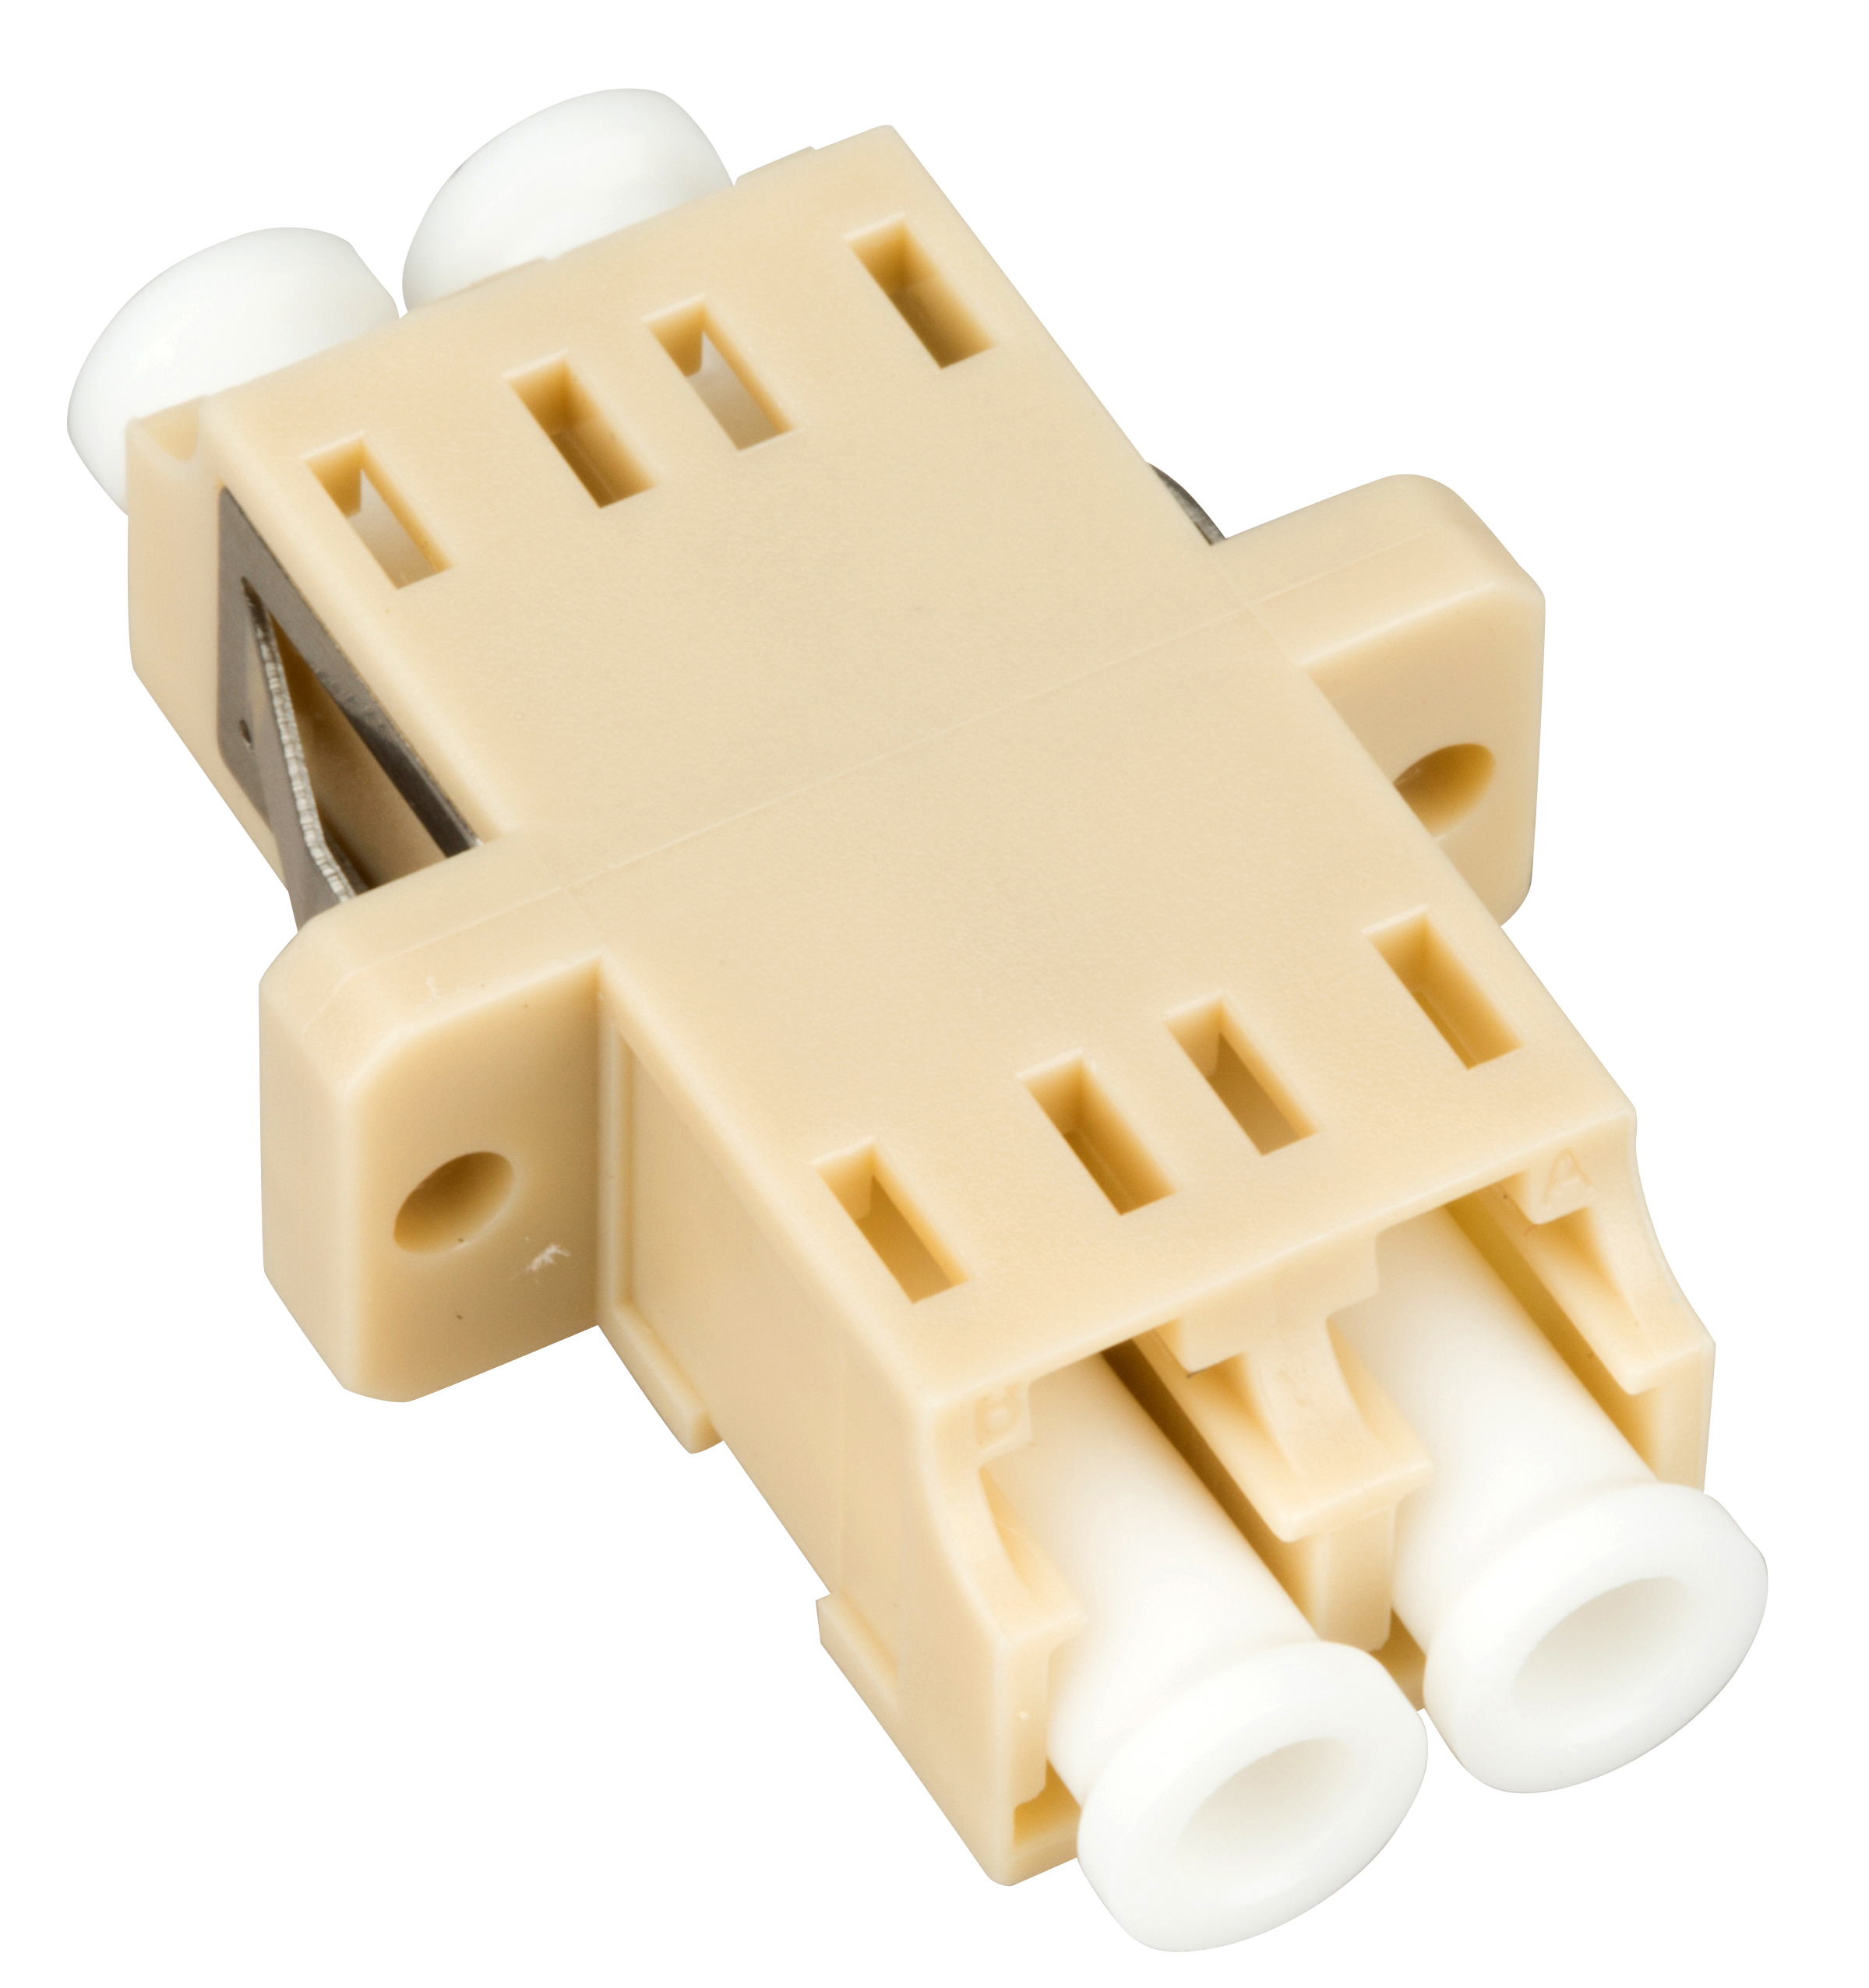 1 Stk LWL Kupplung LC-Duplex, Multimode, zirc, Flansch, beige, ECO HMOLE00051